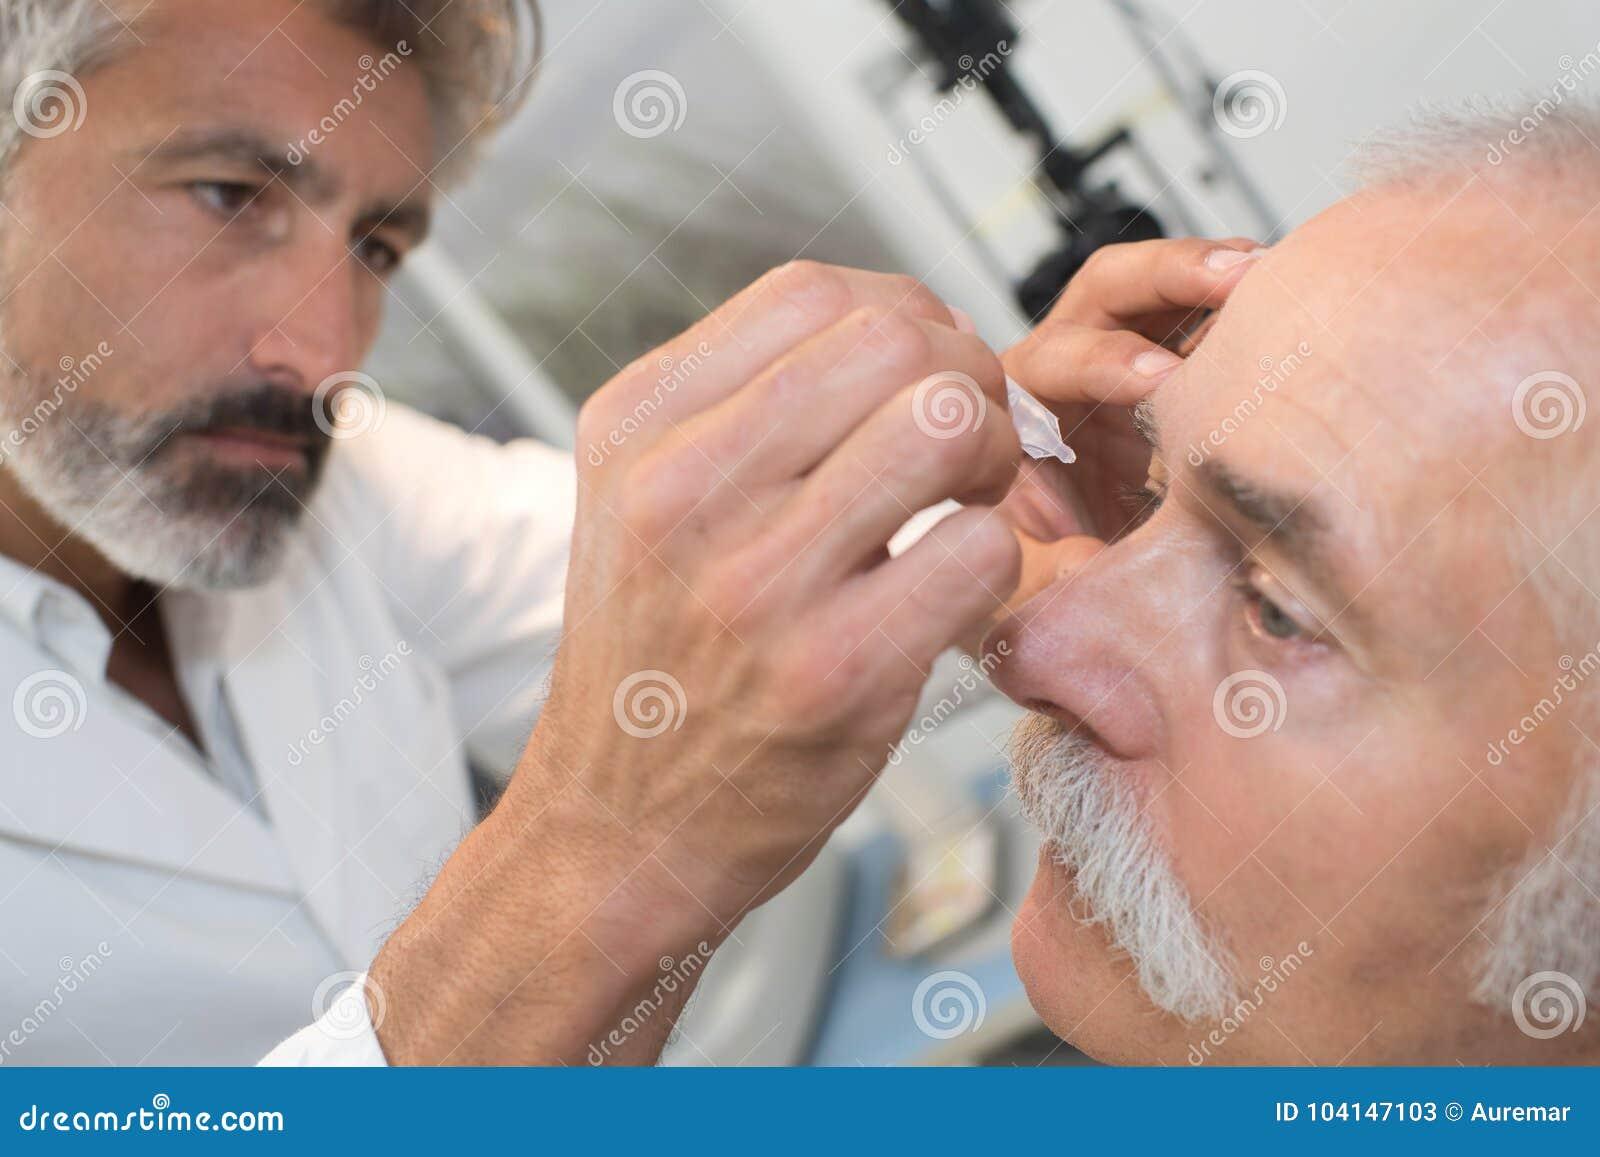 download optometrist using mydriatics eye drops to numb eyes stock image image of lens